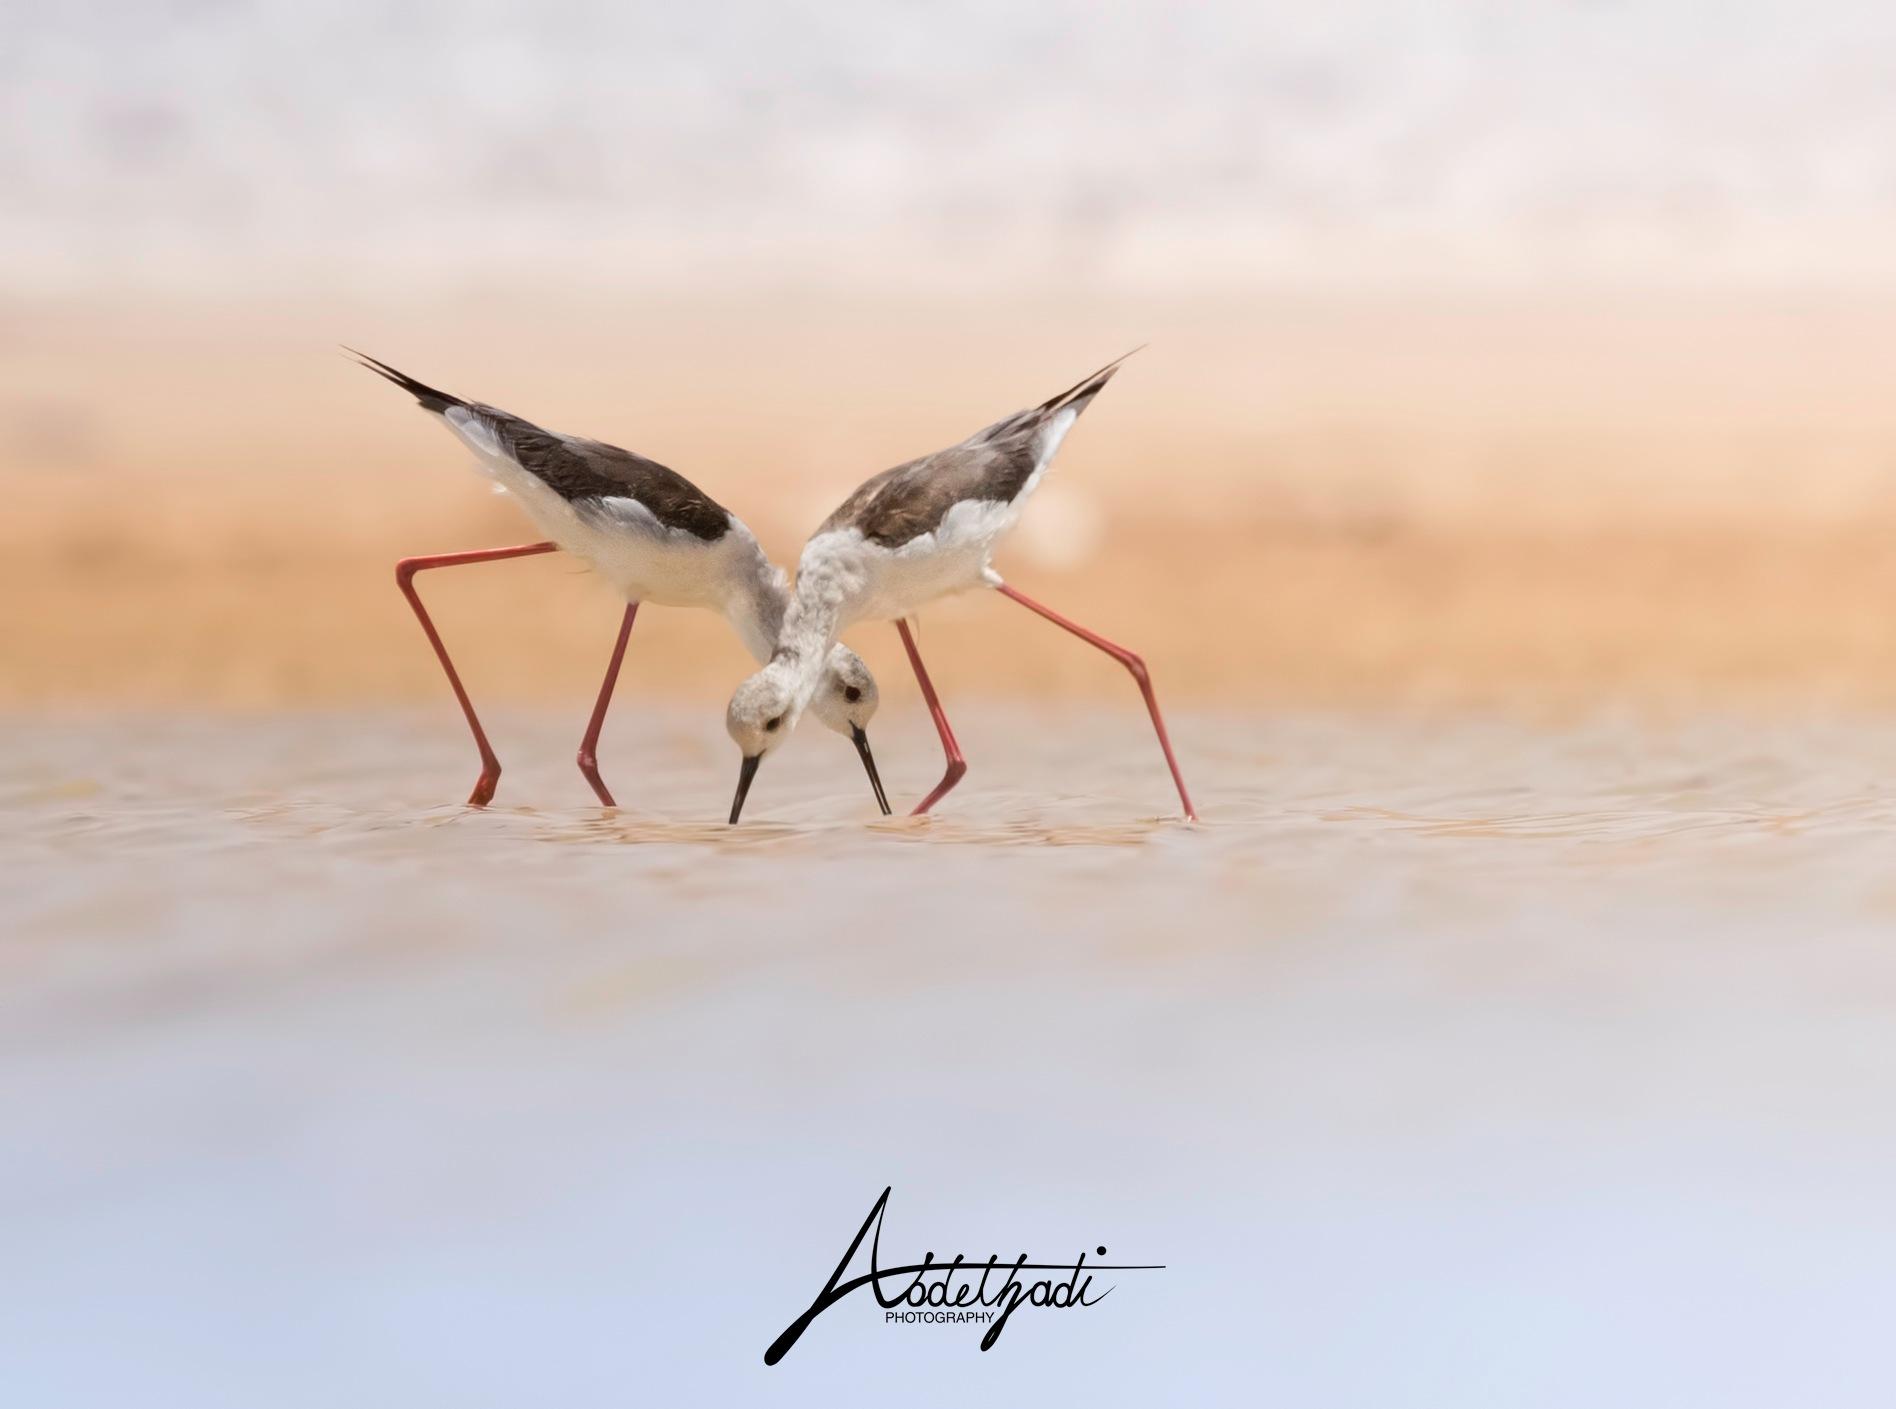 Untitled by Abdel Hadi